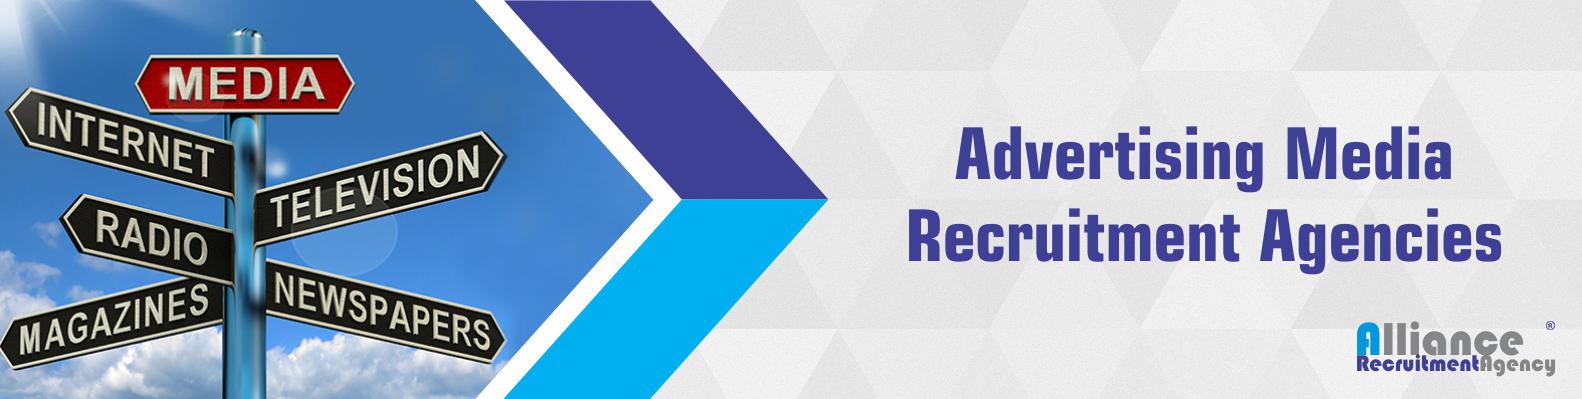 Media Recruitment Agencies - Top Recruitment Agencies for Advertising